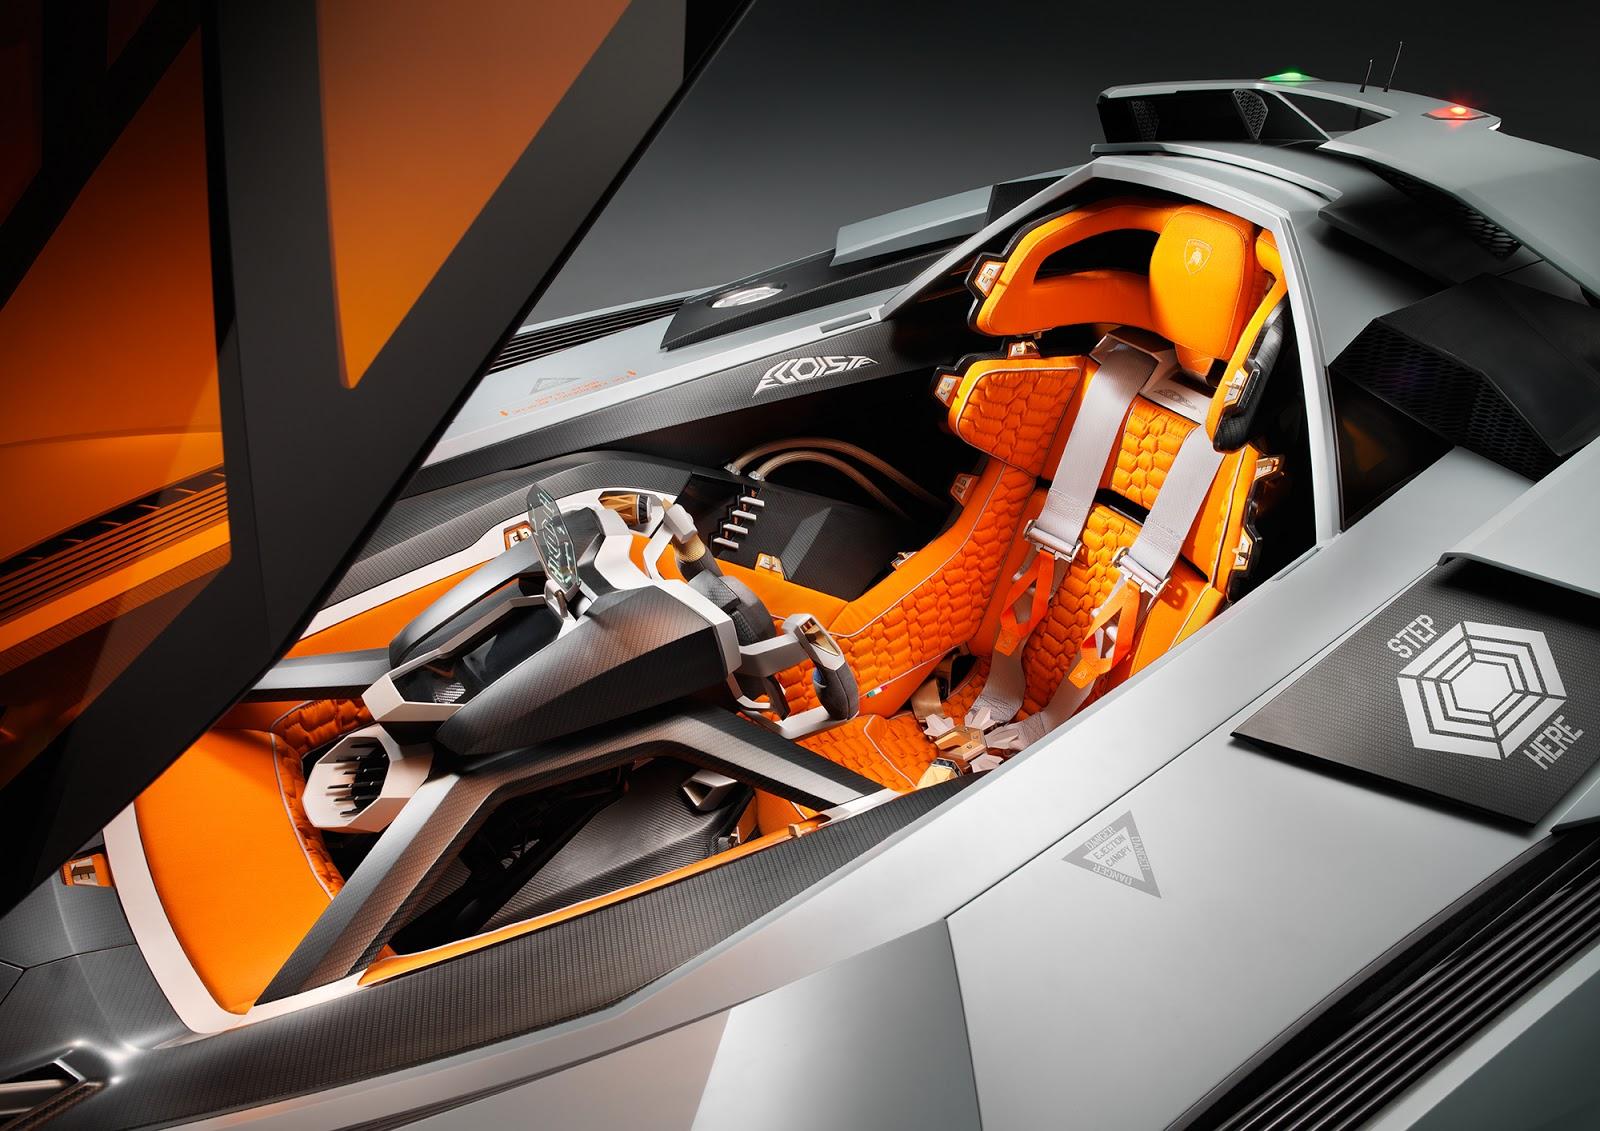 The Egoista Contains, In Walter De Silvau0027s Opinion, All The Product  Criteria Which Are Part Of Lamborghiniu0027s Make Up. U201cItu0027s As If Ferruccio  Lamborghini Were ...